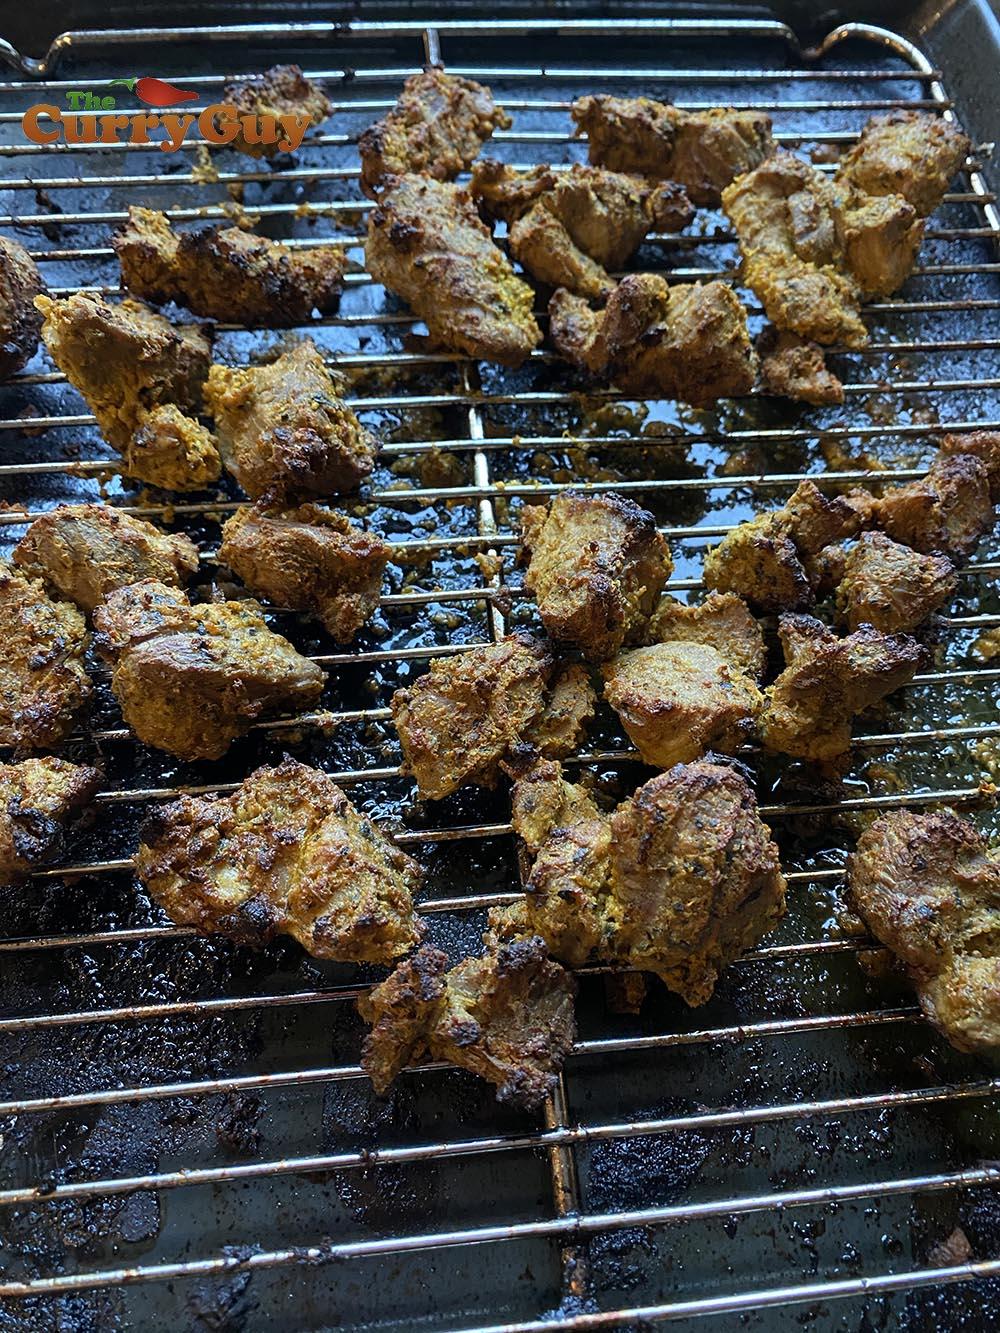 Cooked lamb tikka